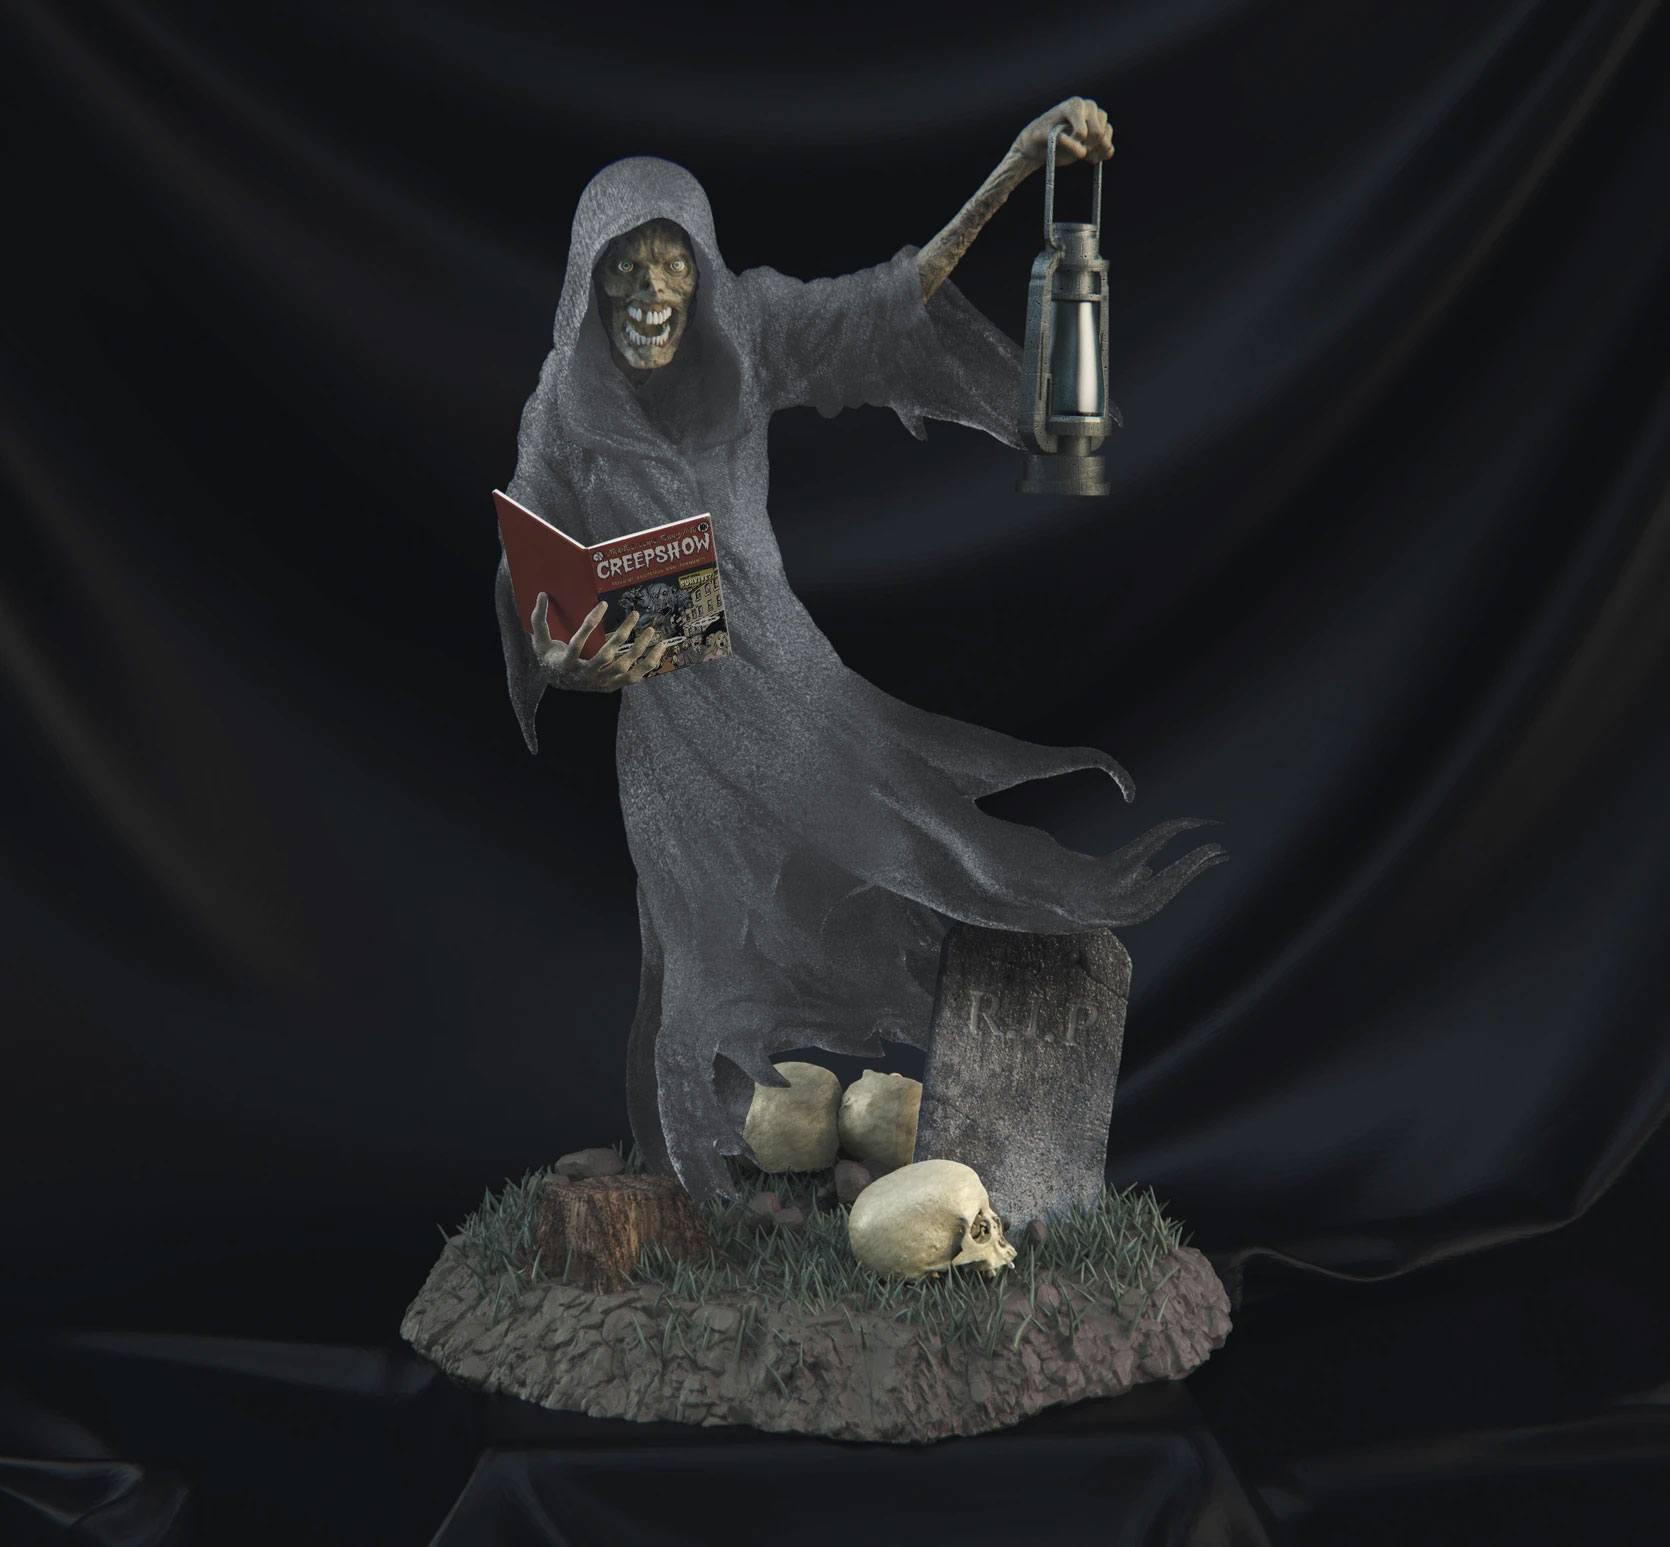 Creepshow PVC Statue 1/10 The Creep 30 cm